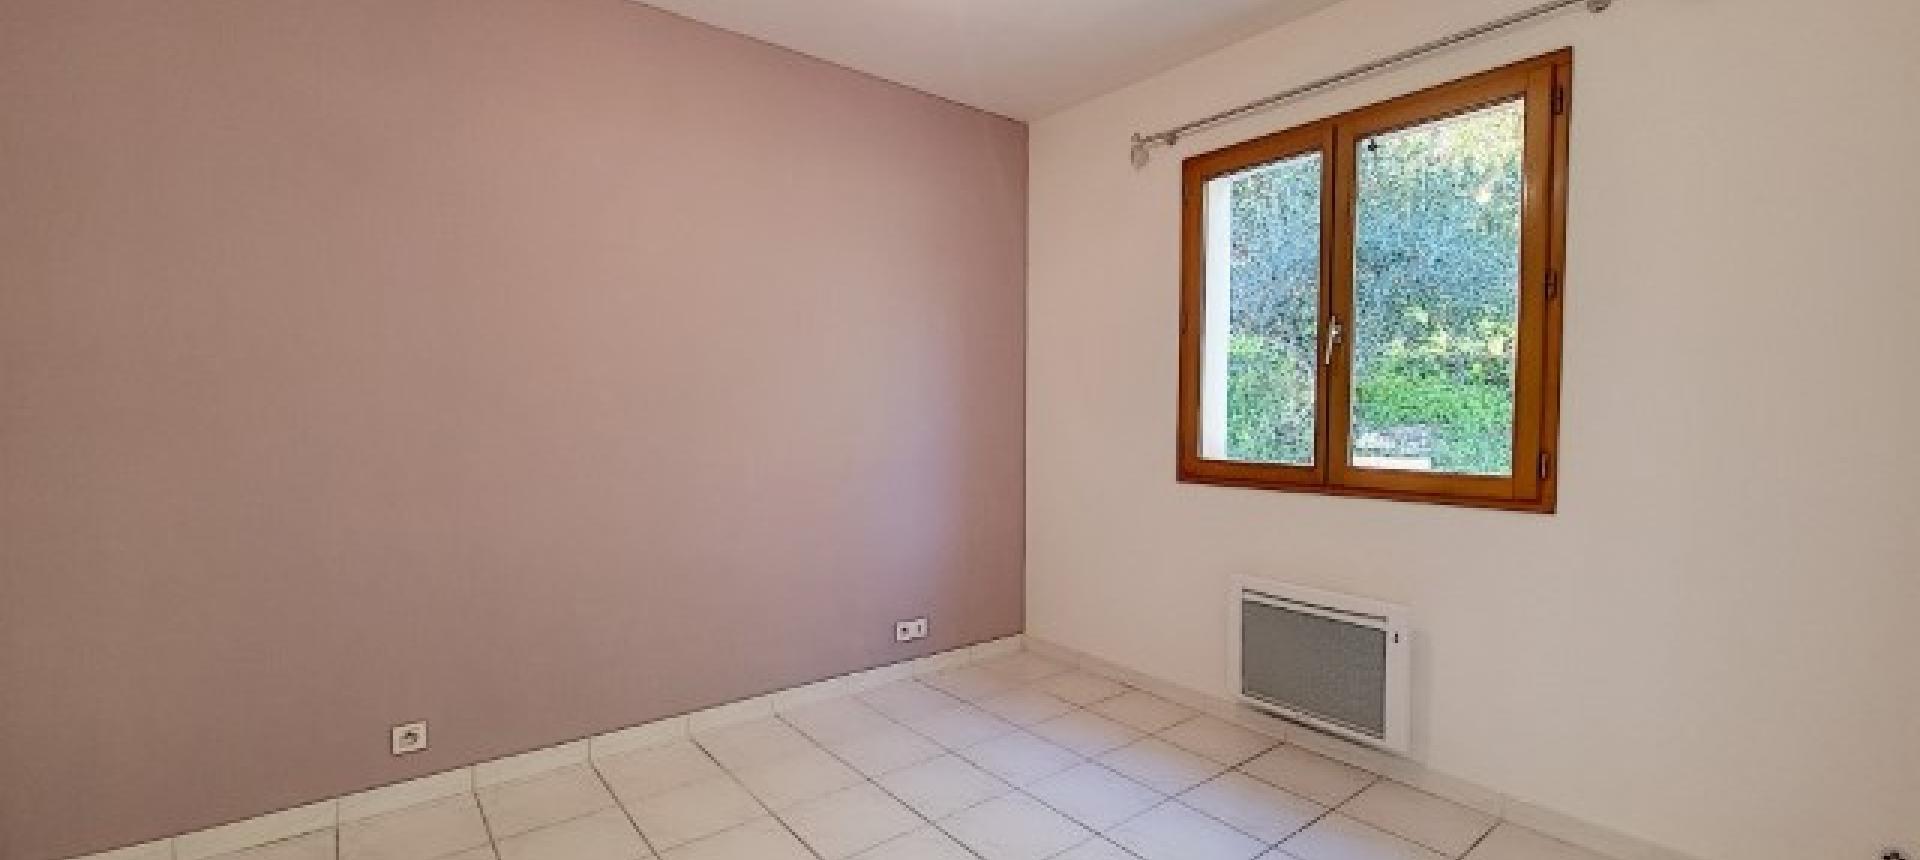 Villa F4 à louer avec jardin et terrasse à Bastelicaccia  chambre